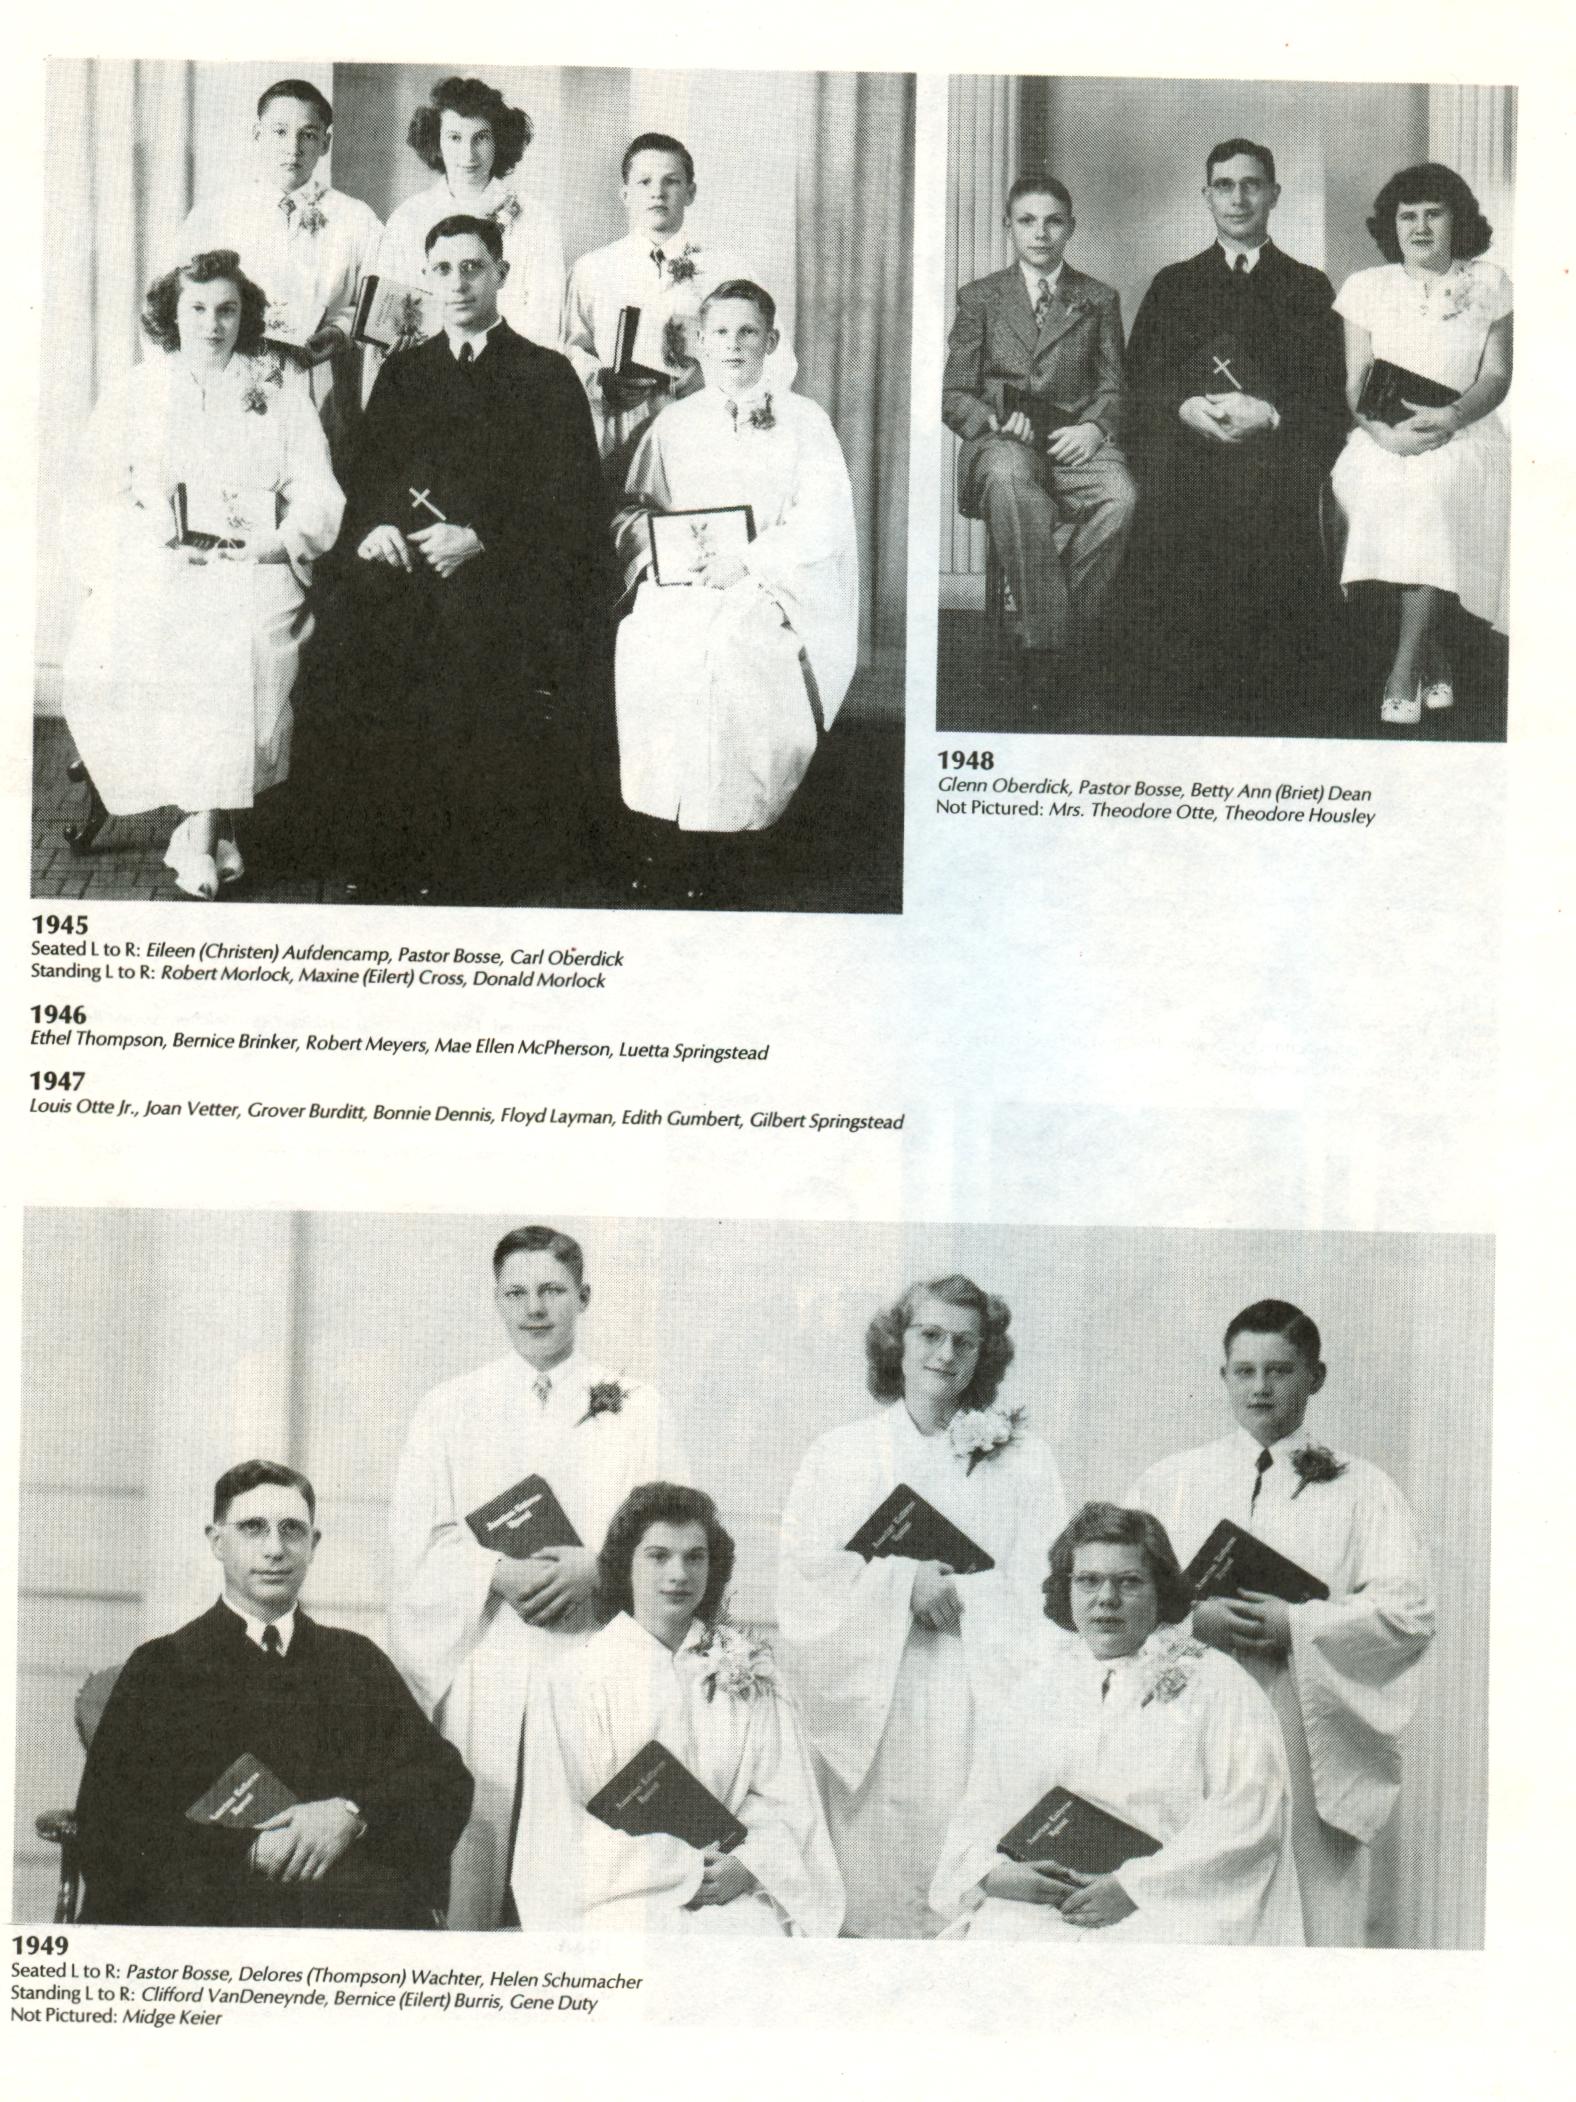 pictures Enrico Colantoni